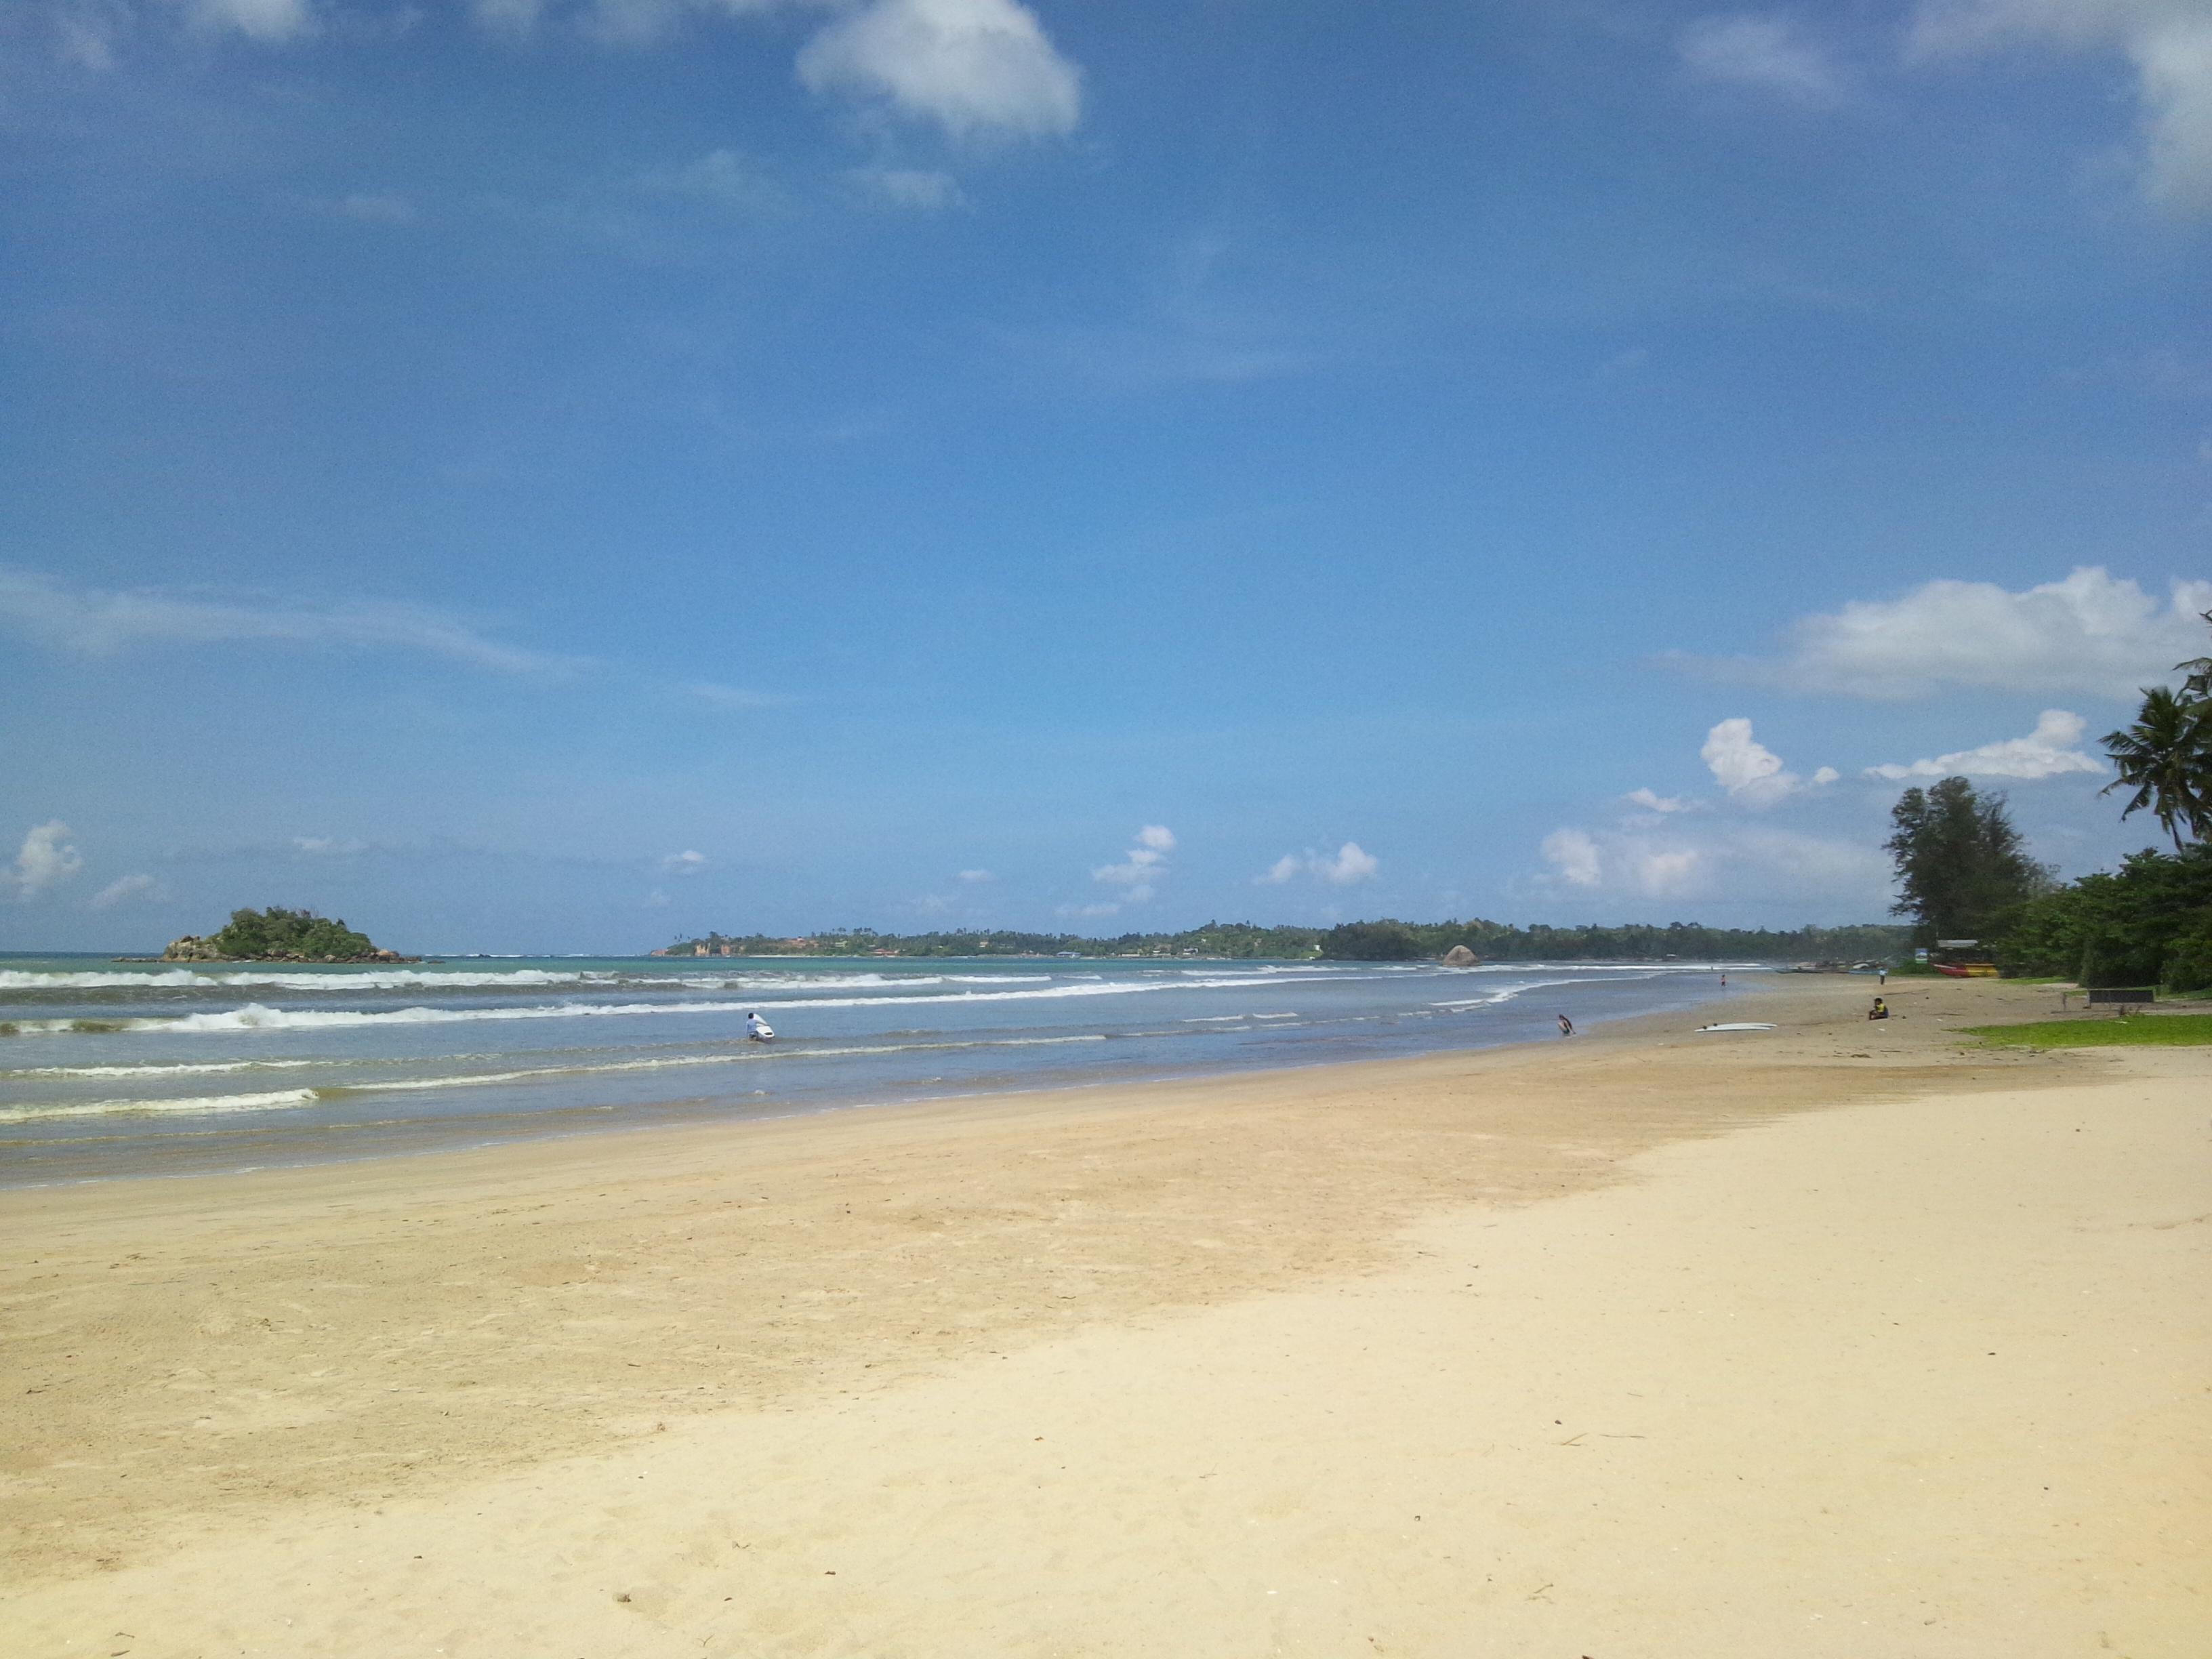 Weligama Sri Lanka  city pictures gallery : Weligama Beach in Sri Lanka Wikimedia Commons